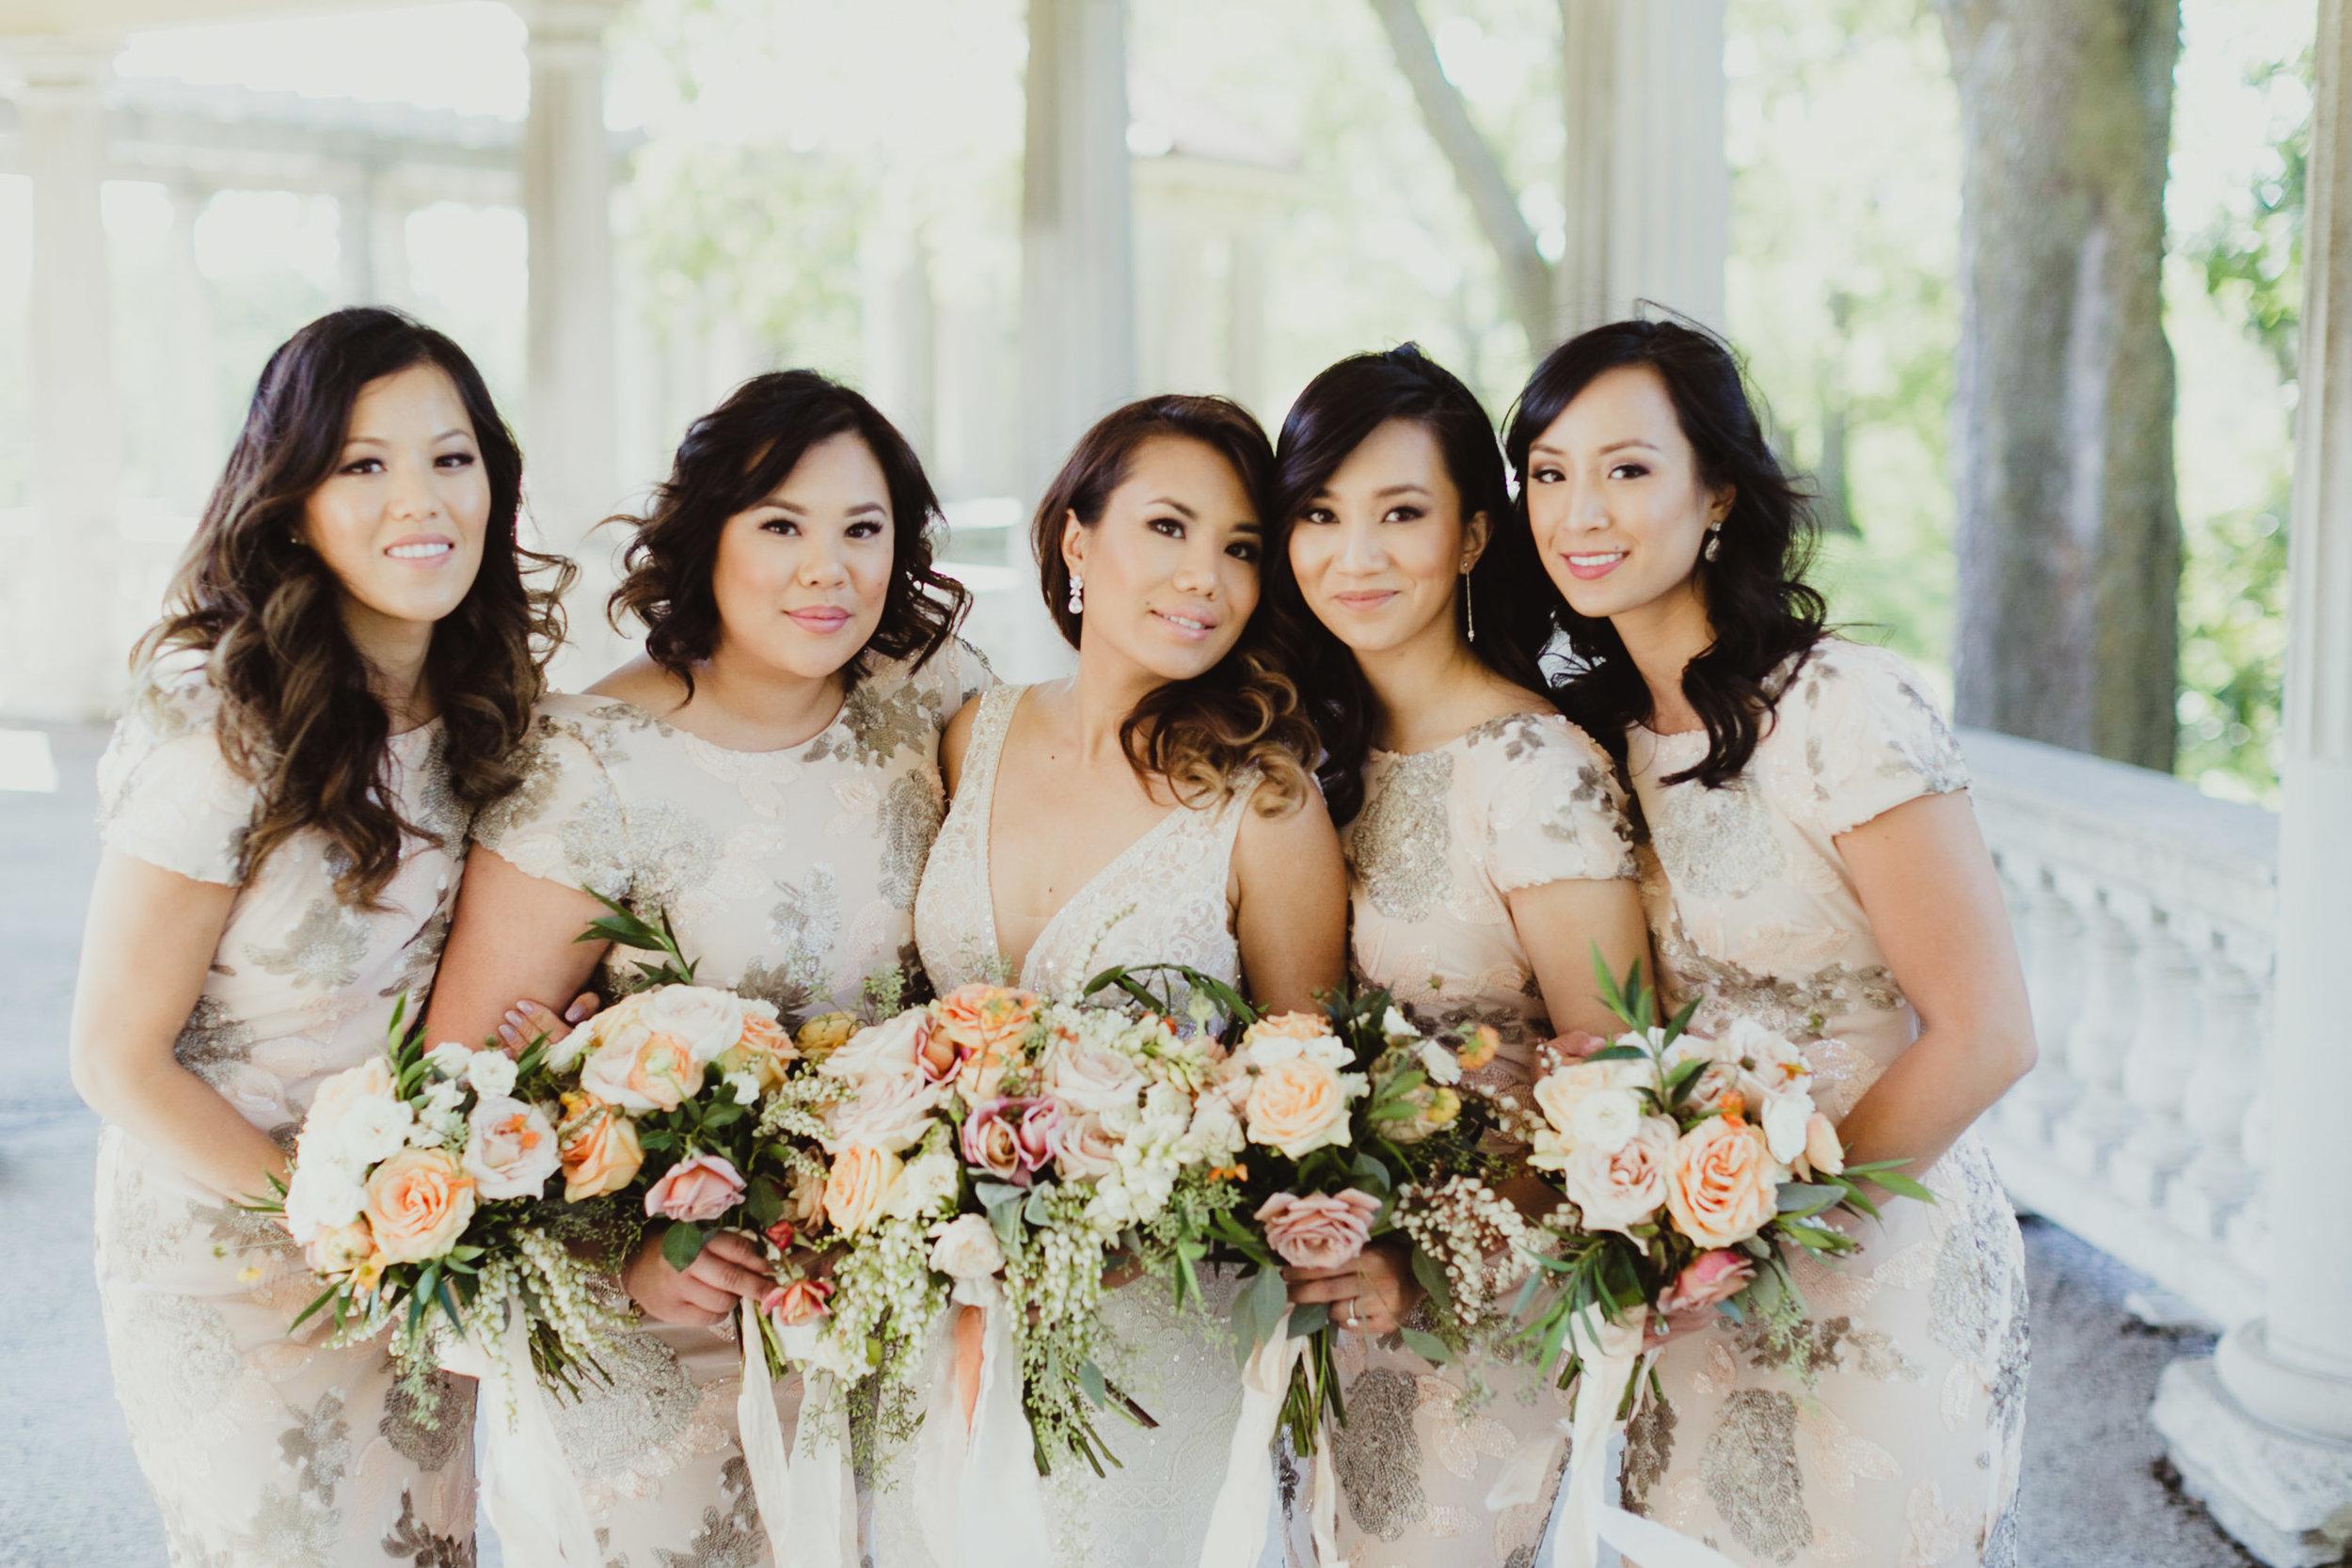 kansas-city-wedding-photographer_026.jpg